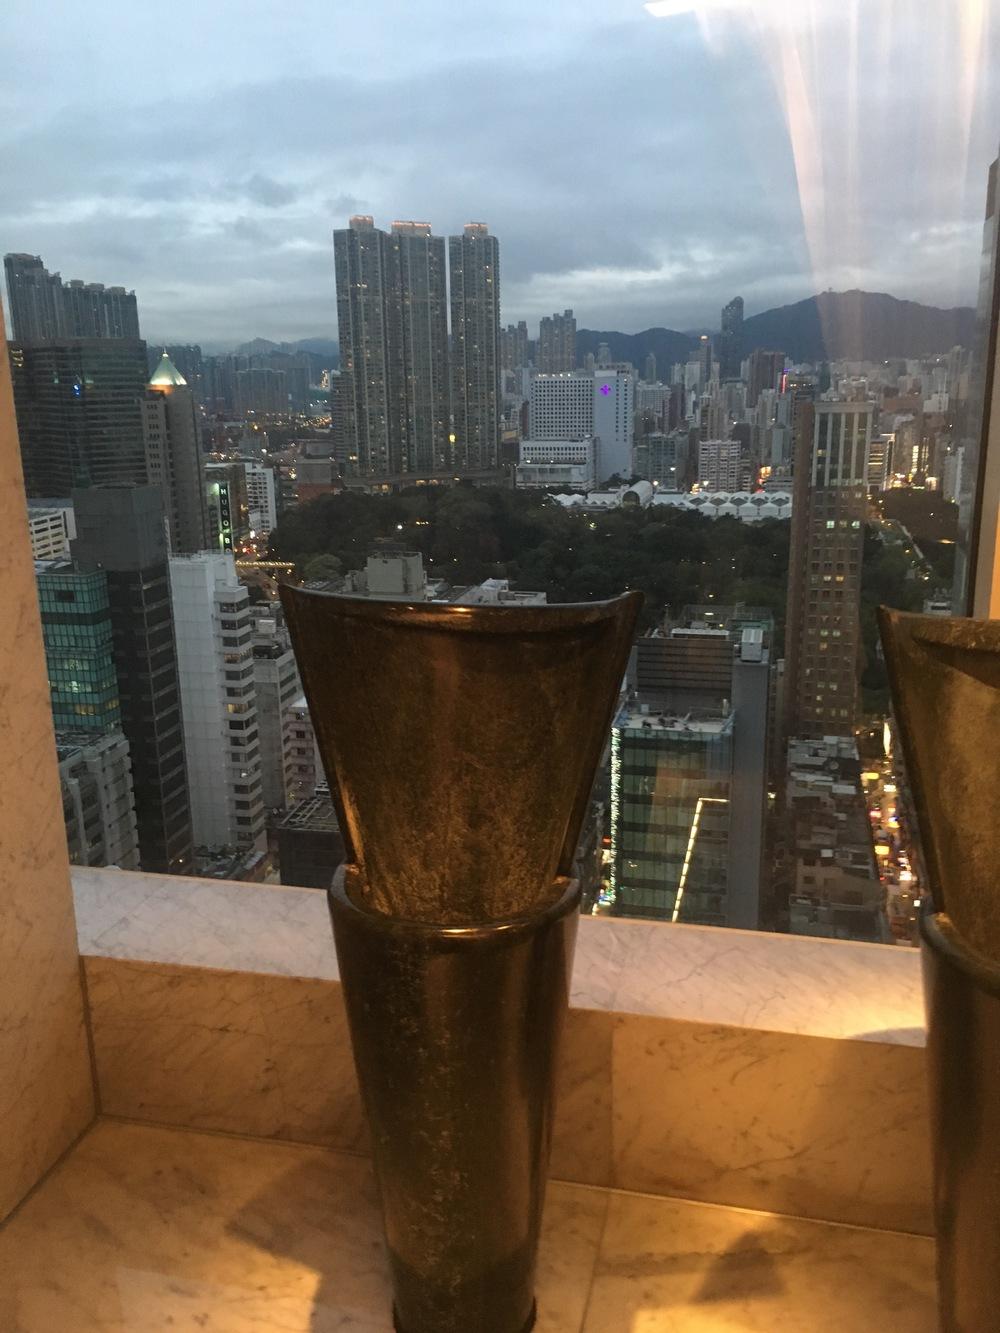 Urinal with views